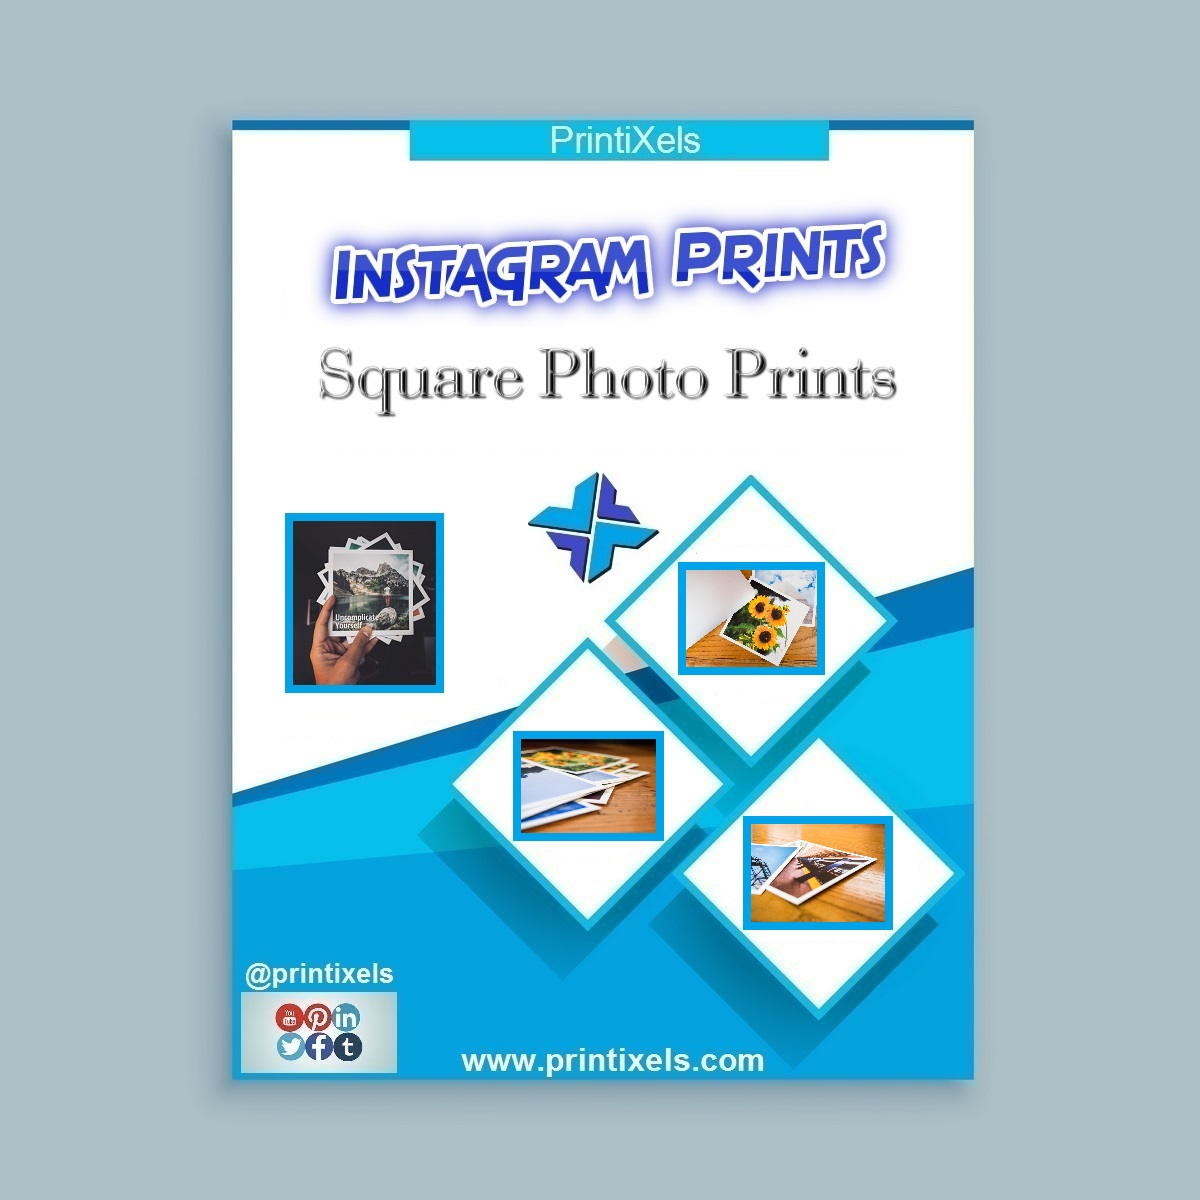 Instagram Prints, Square Photo Prints Online